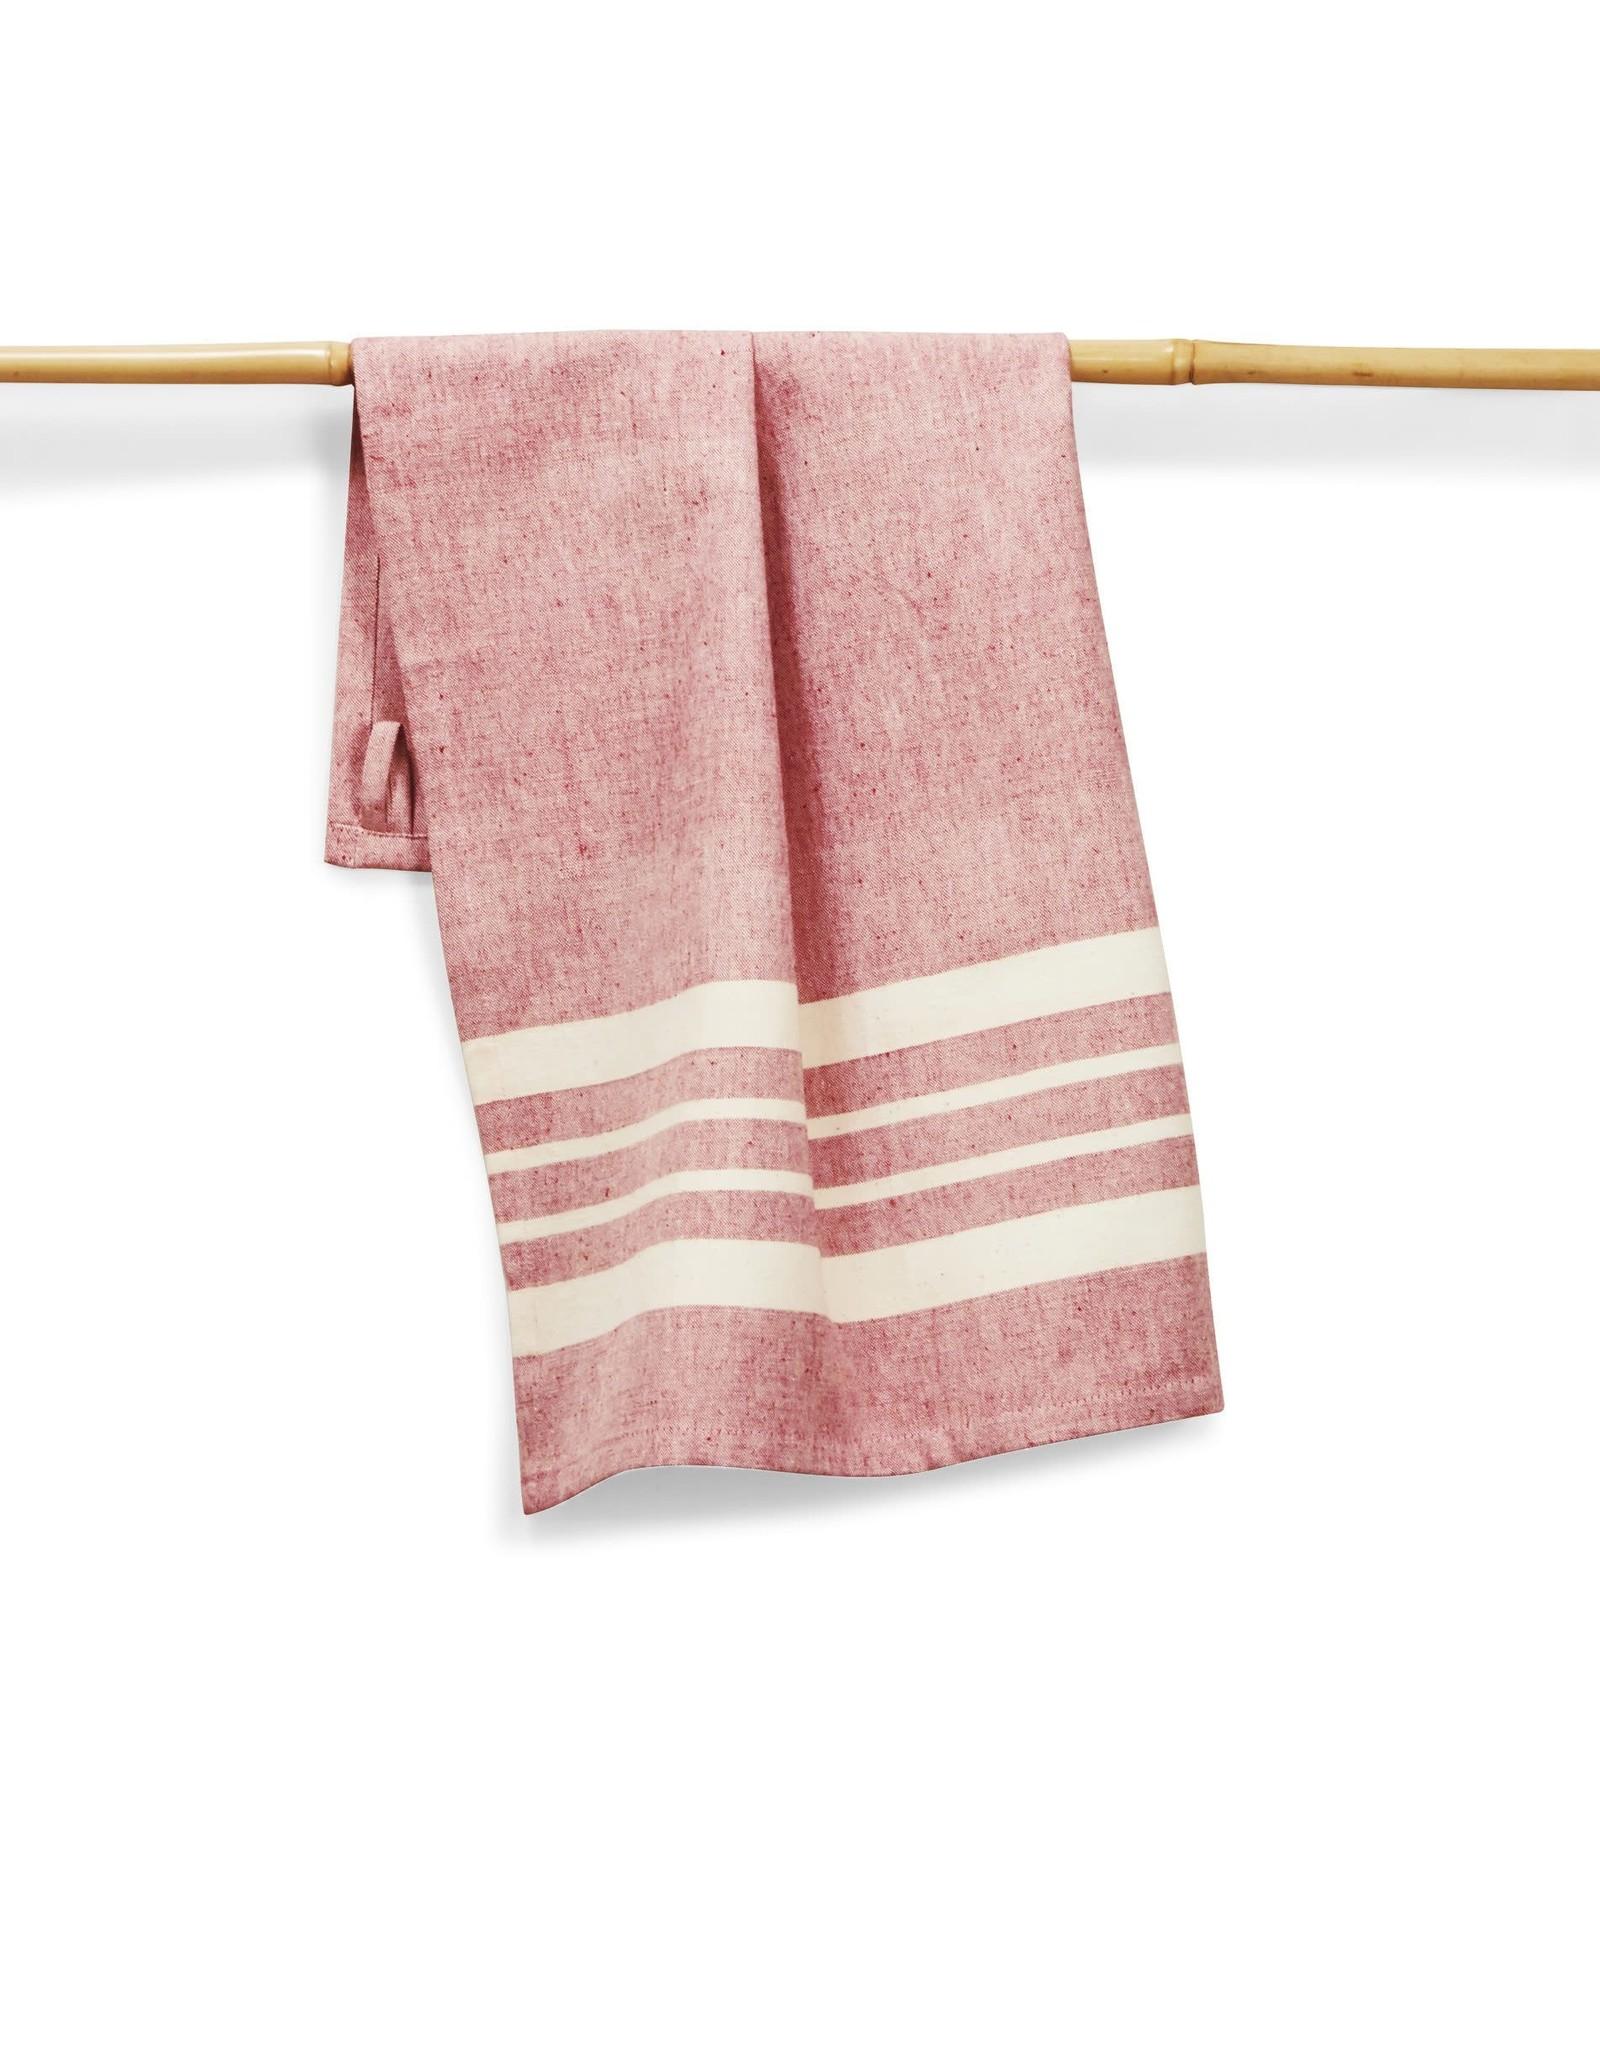 27 x 19 Cotton Handwoven Kitchen Towels Tomato, India